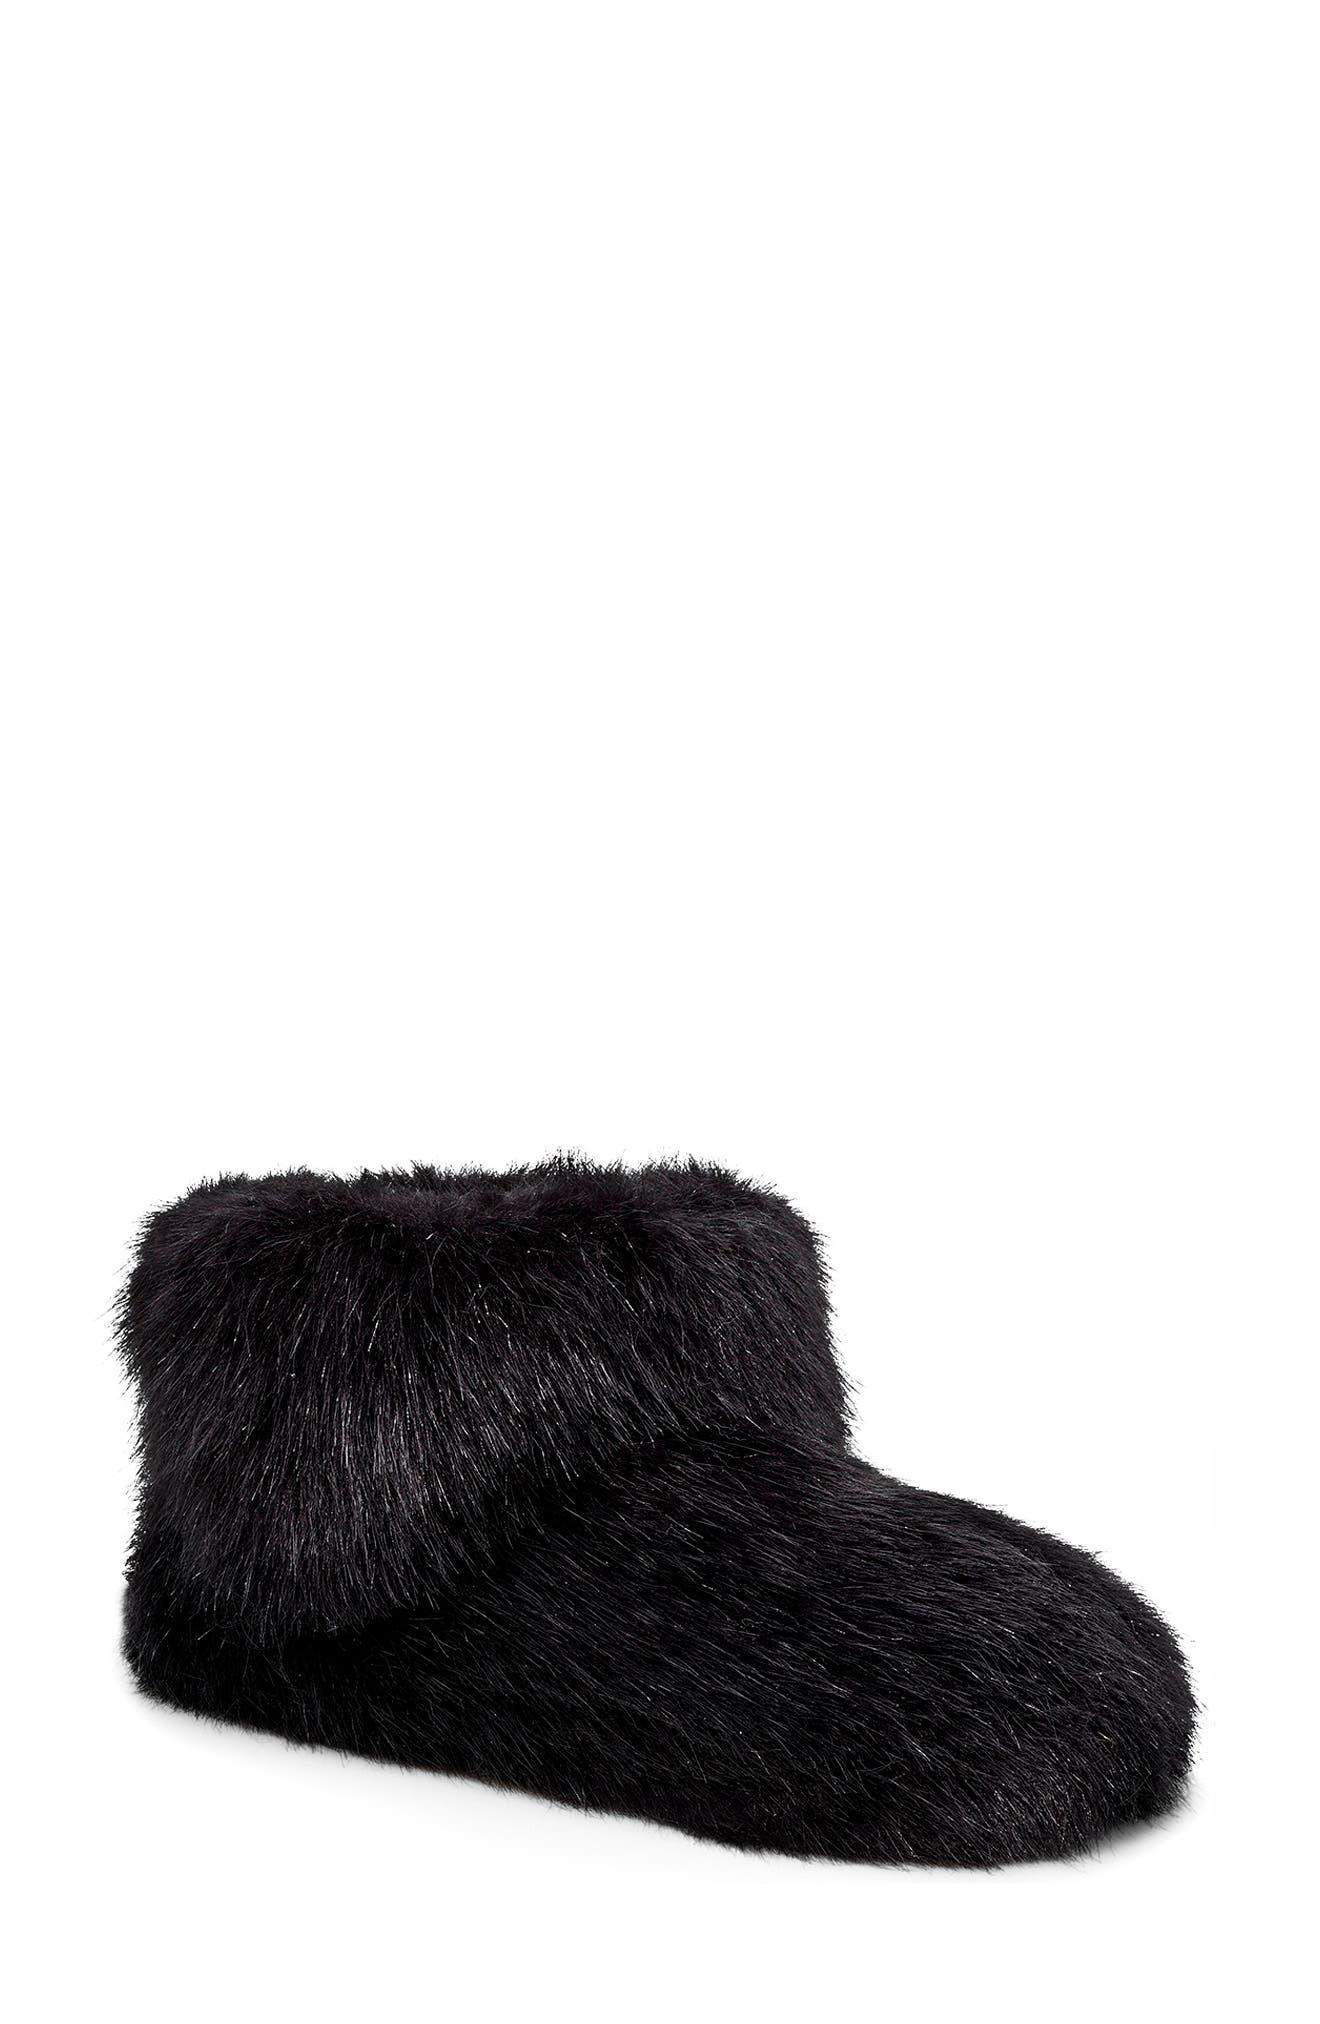 black ugg slippers